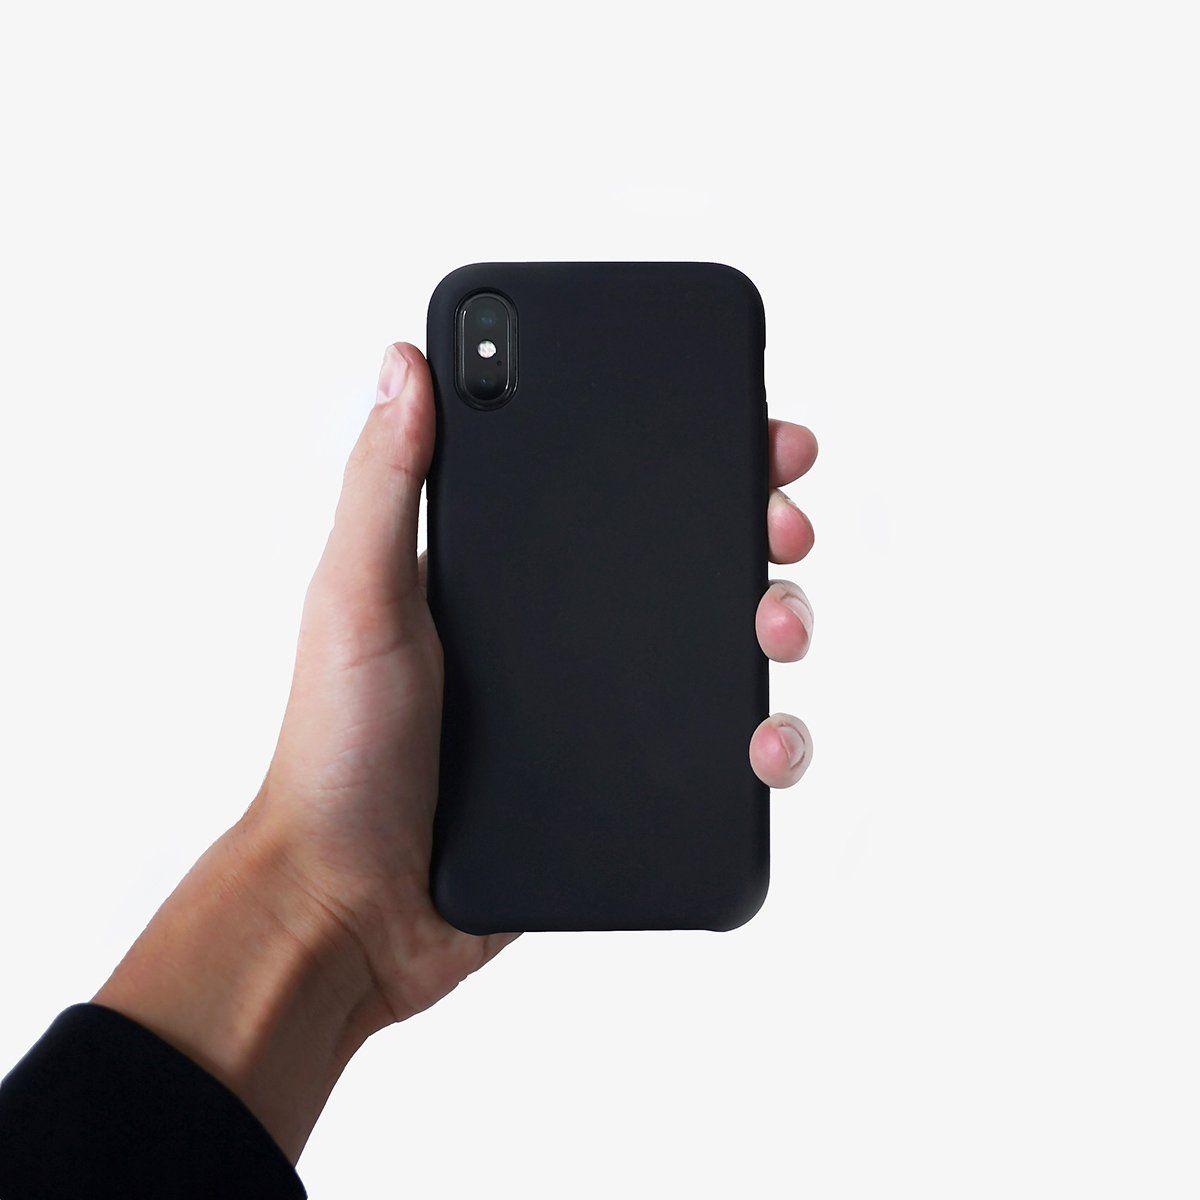 Matte Black Iphone Case Case Desain Kemewahan